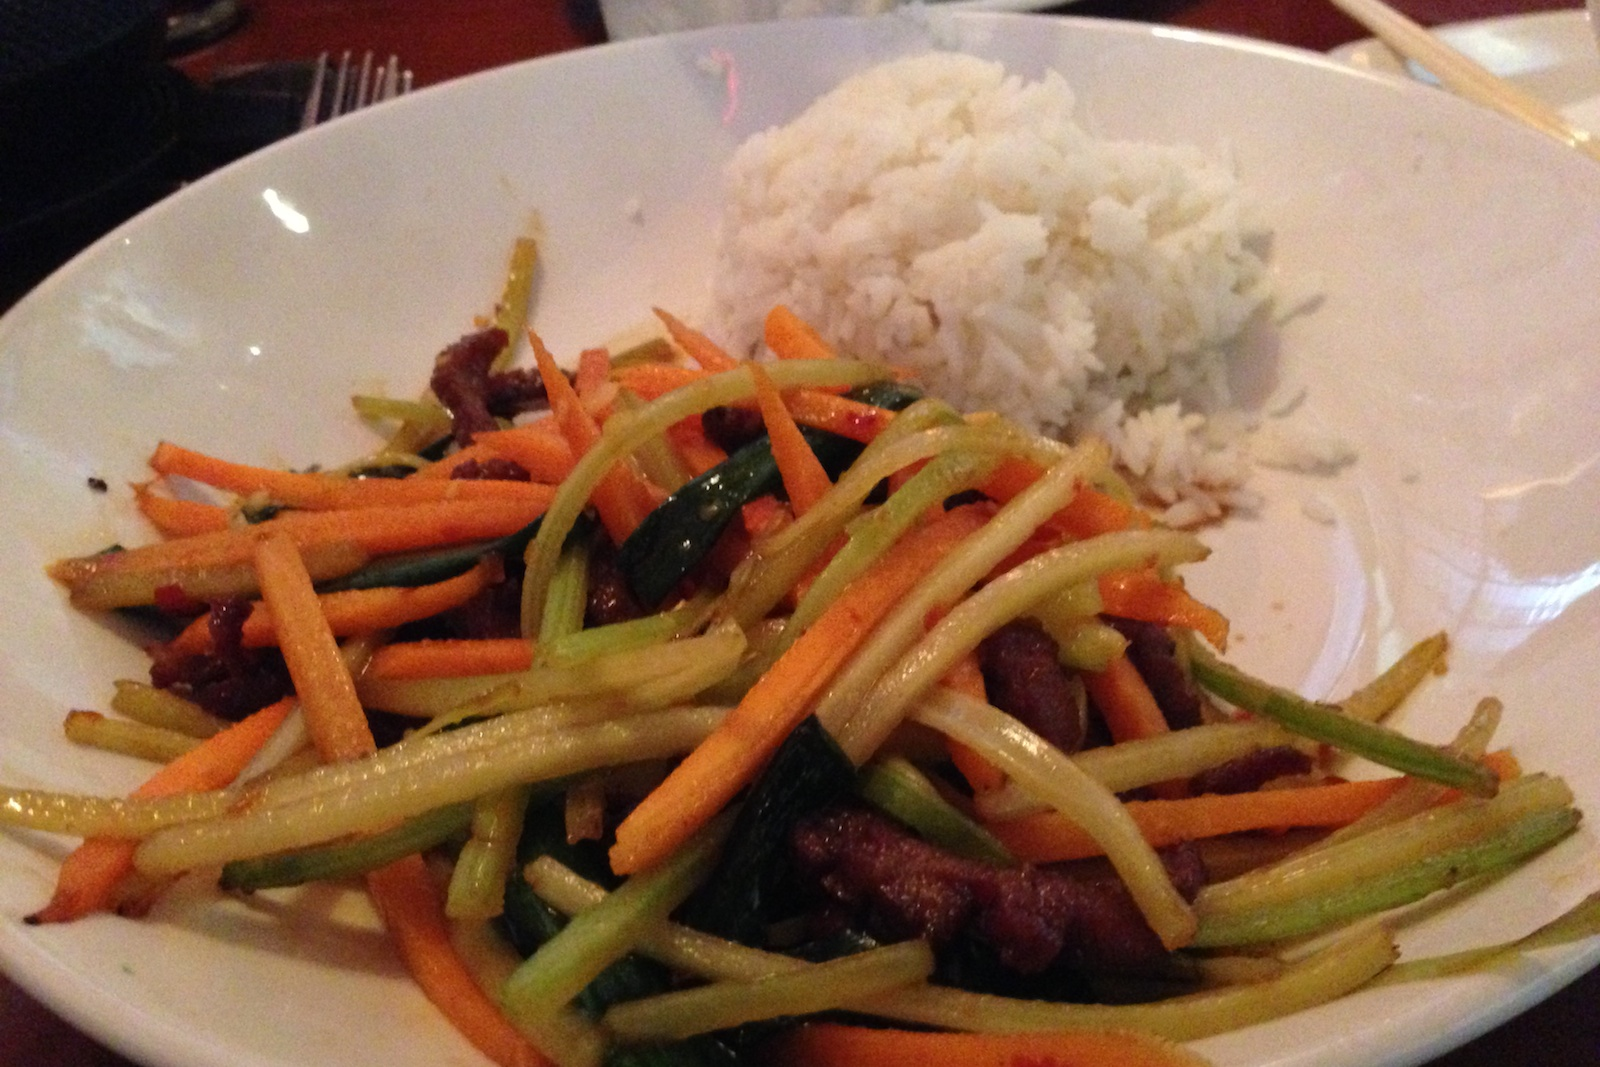 http://blog.rickk.com/food/2014/02/18/ate.2014.02.18.l2.jpg